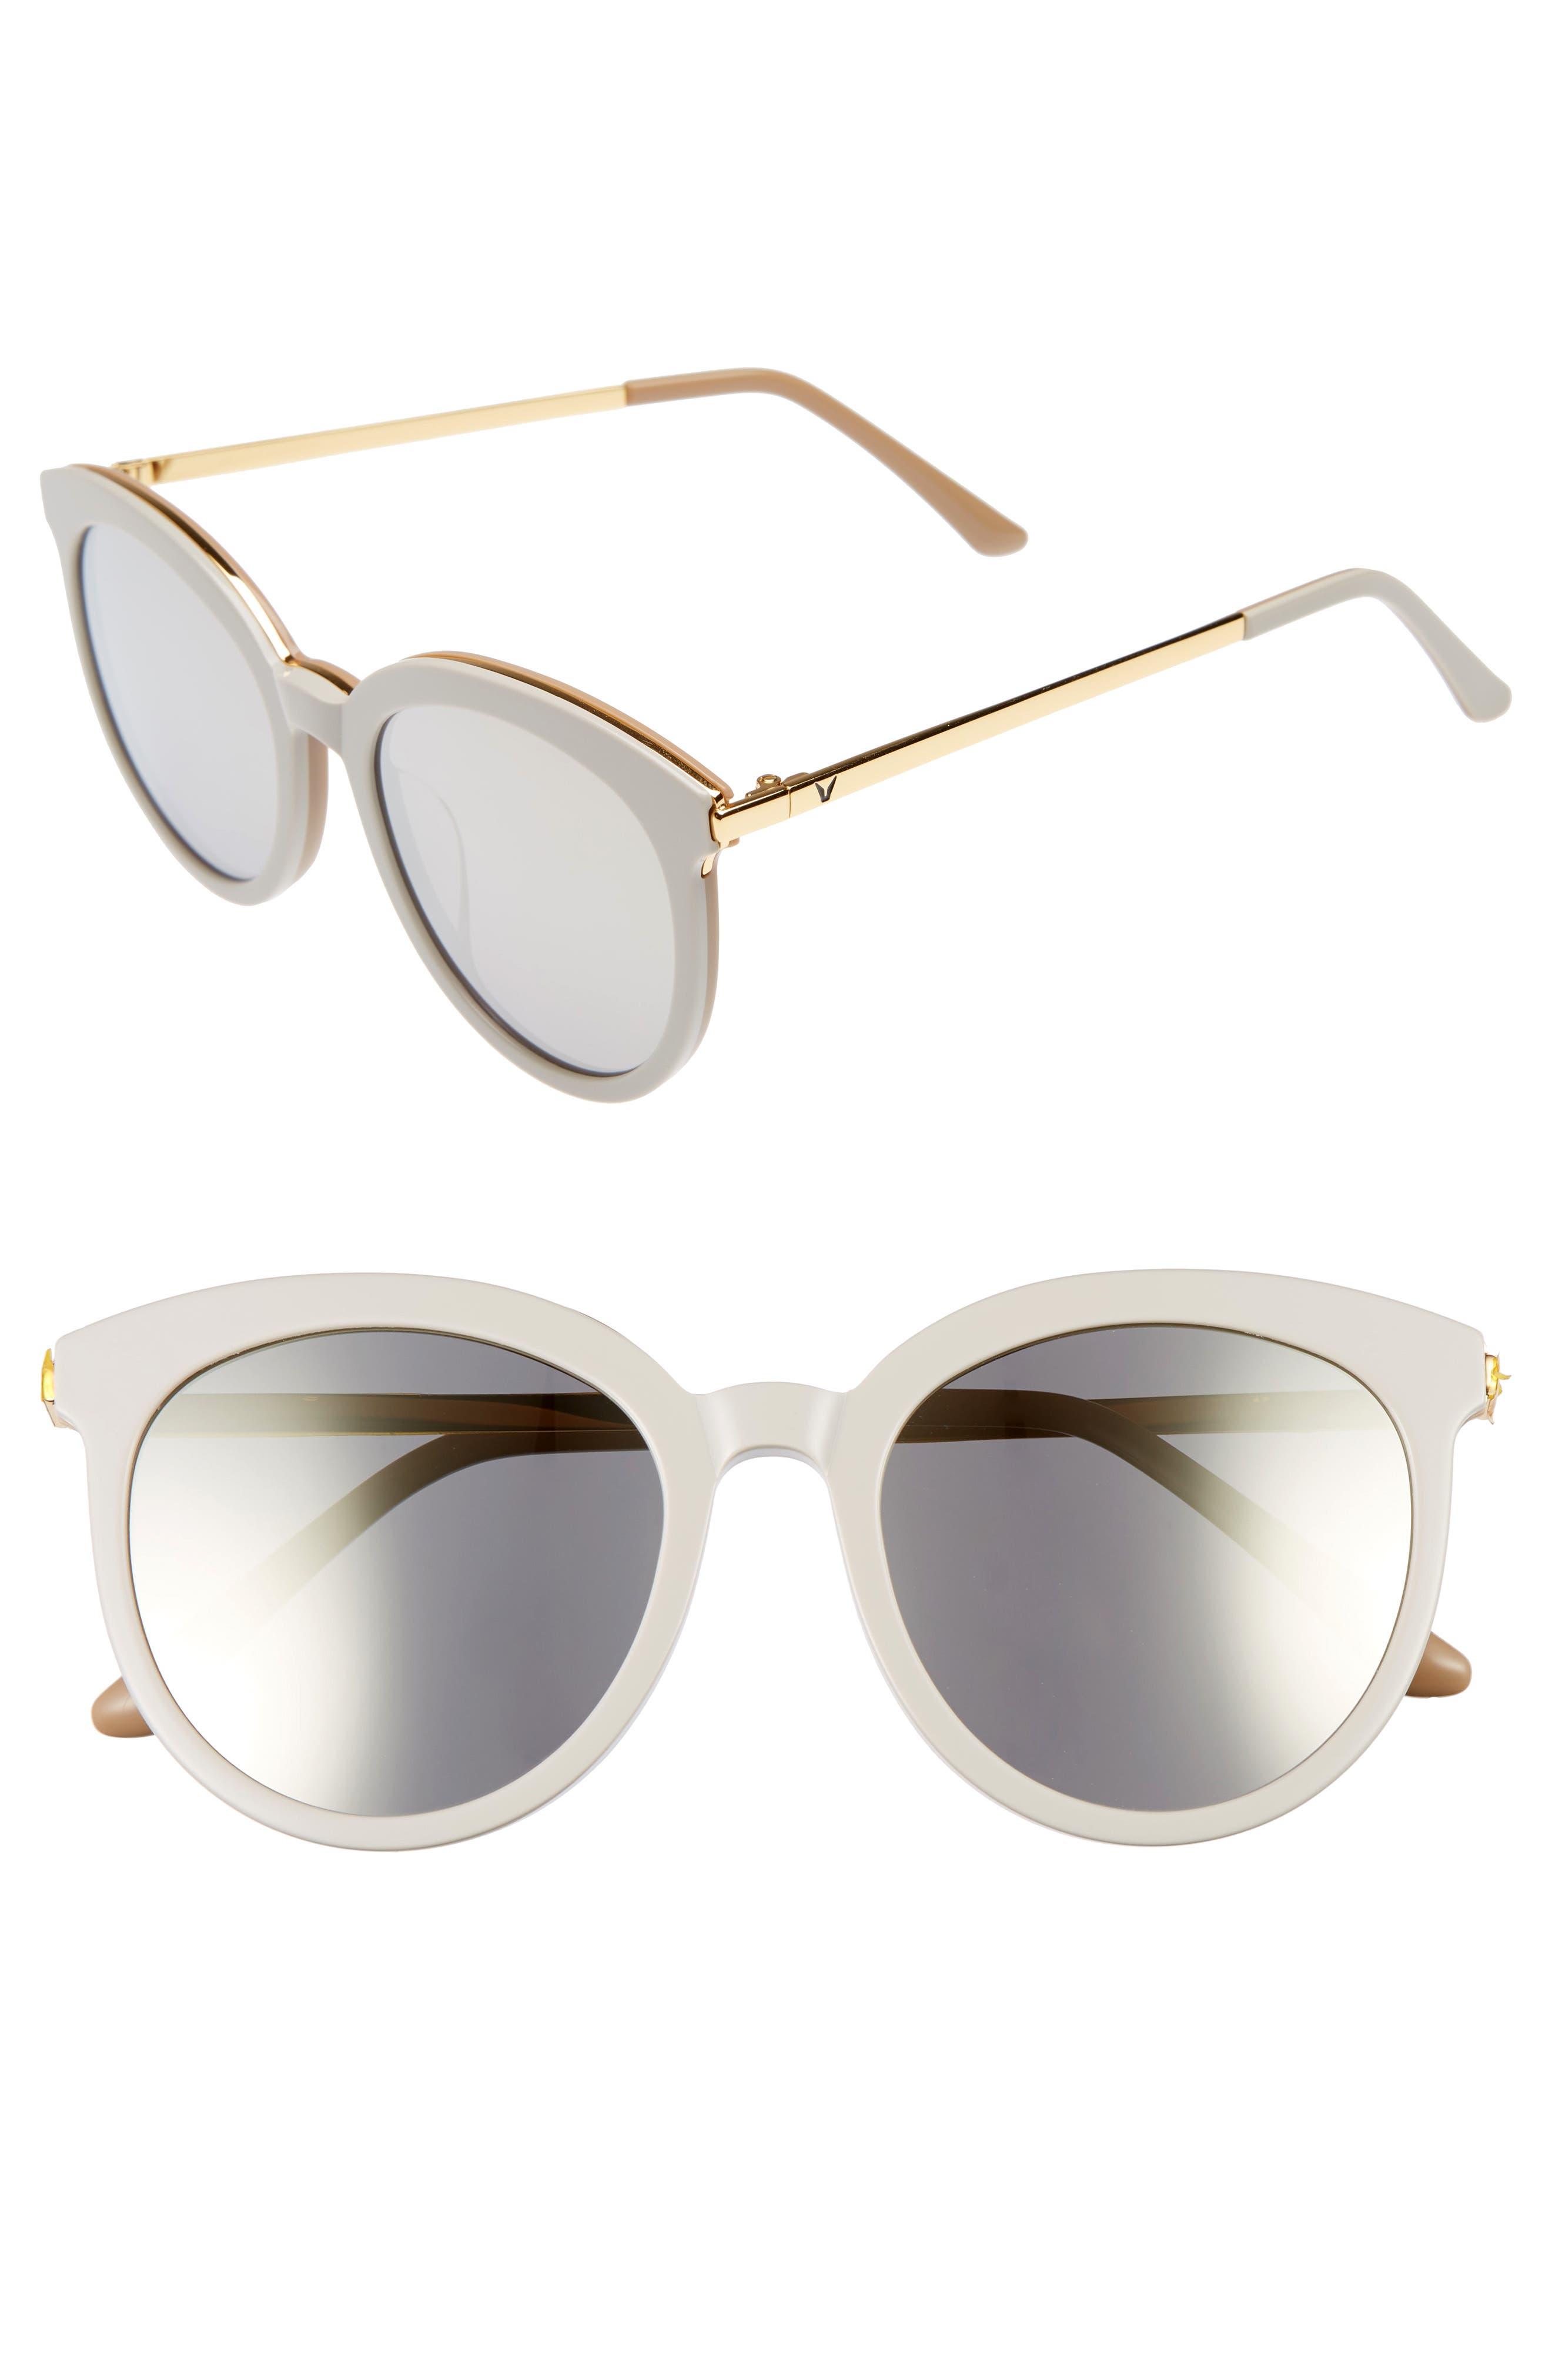 Vanilla Road 54mm Rounded Sunglasses,                             Main thumbnail 1, color,                             Grey/ Gold